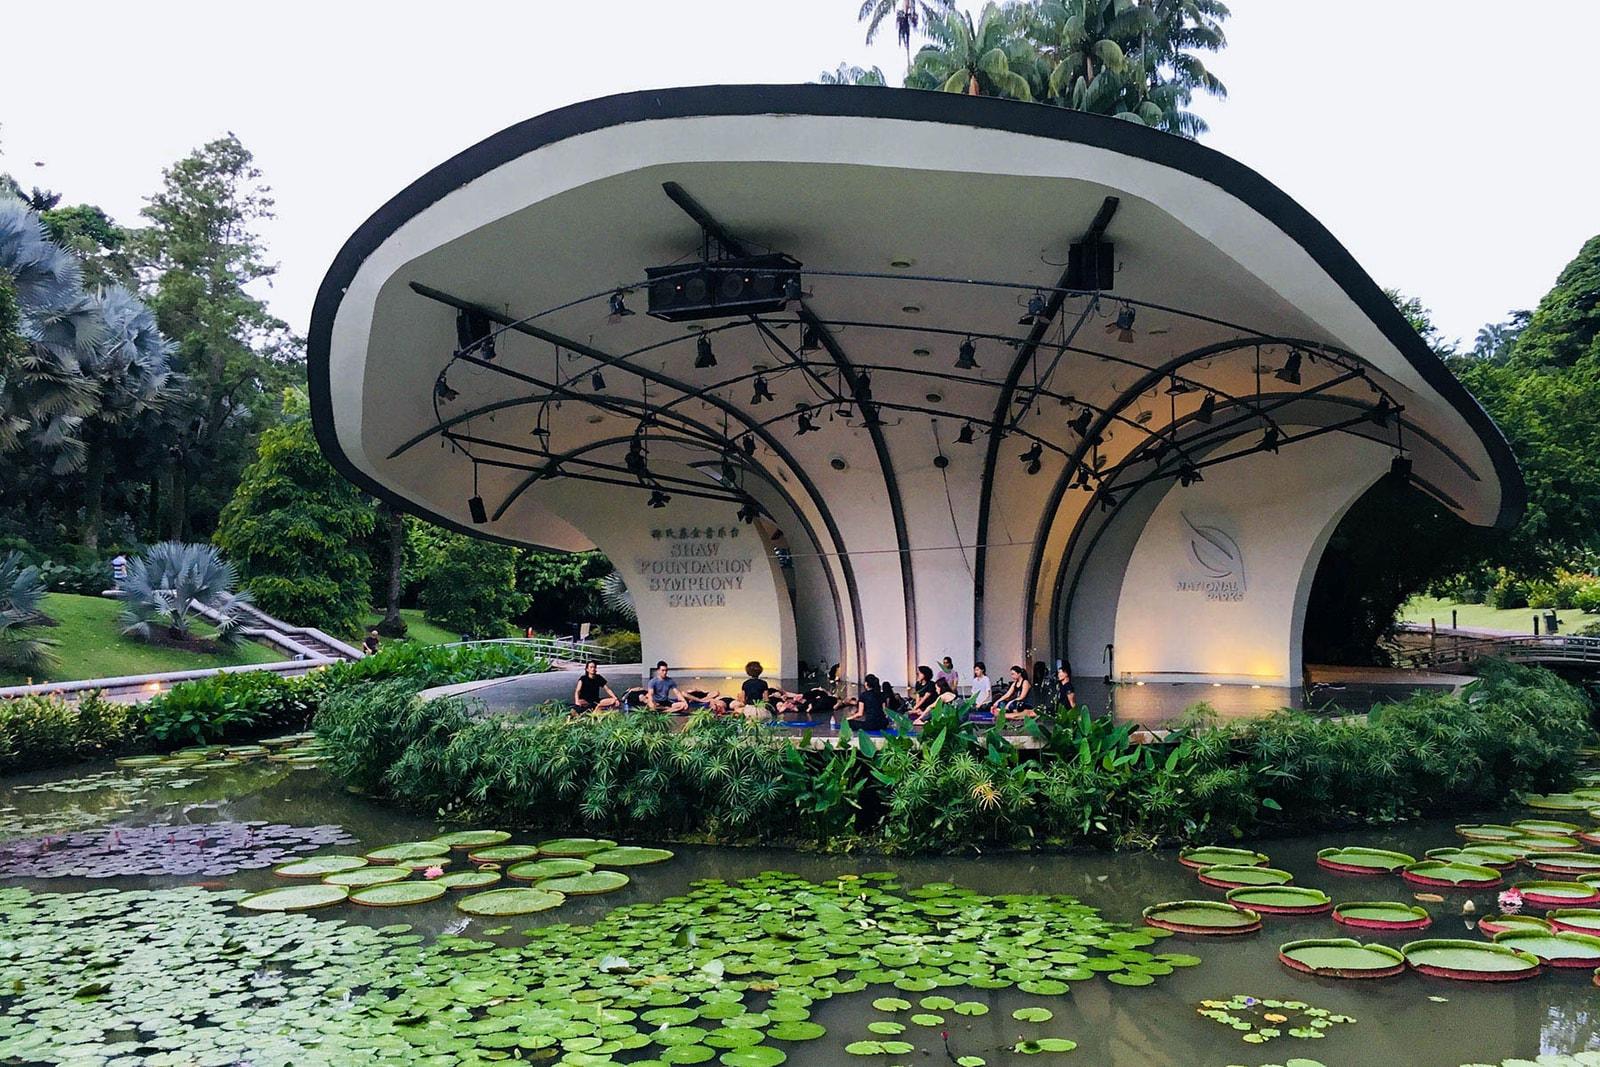 ASICS SMSB Singapore 2017 Recap